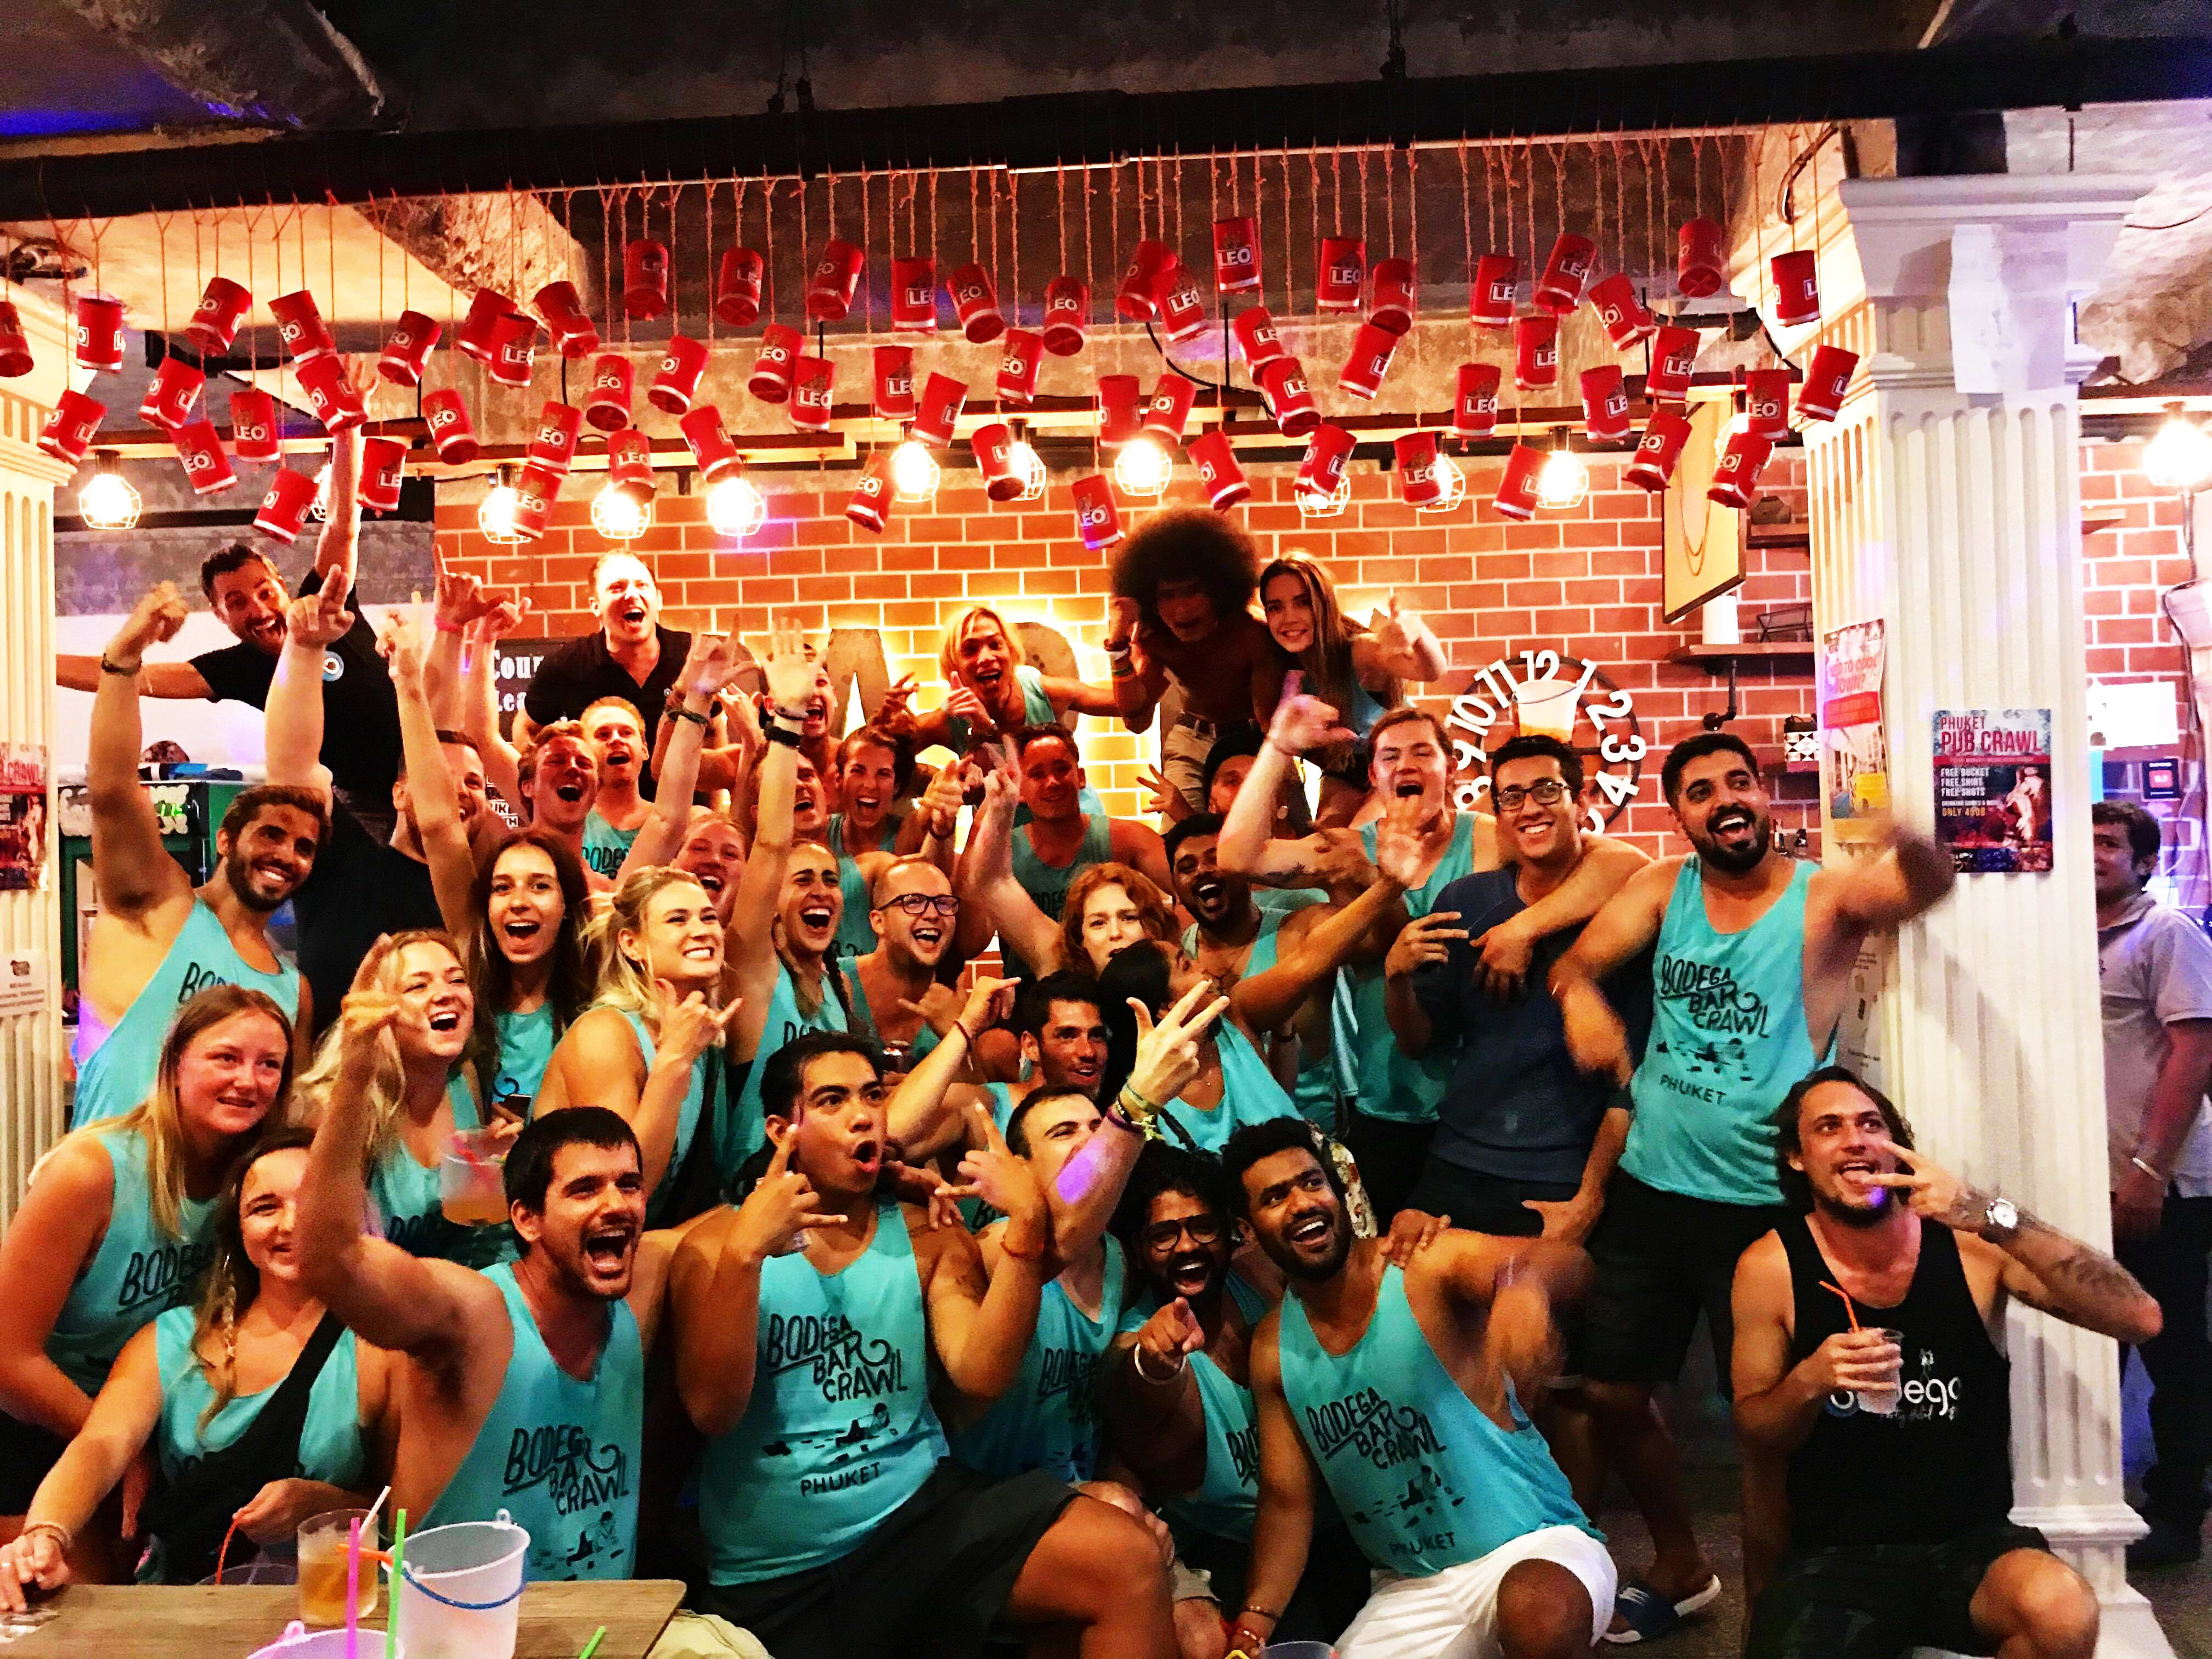 Bodega Phuket Party Hostel Phuket 2021 Prices Reviews Hostelworld